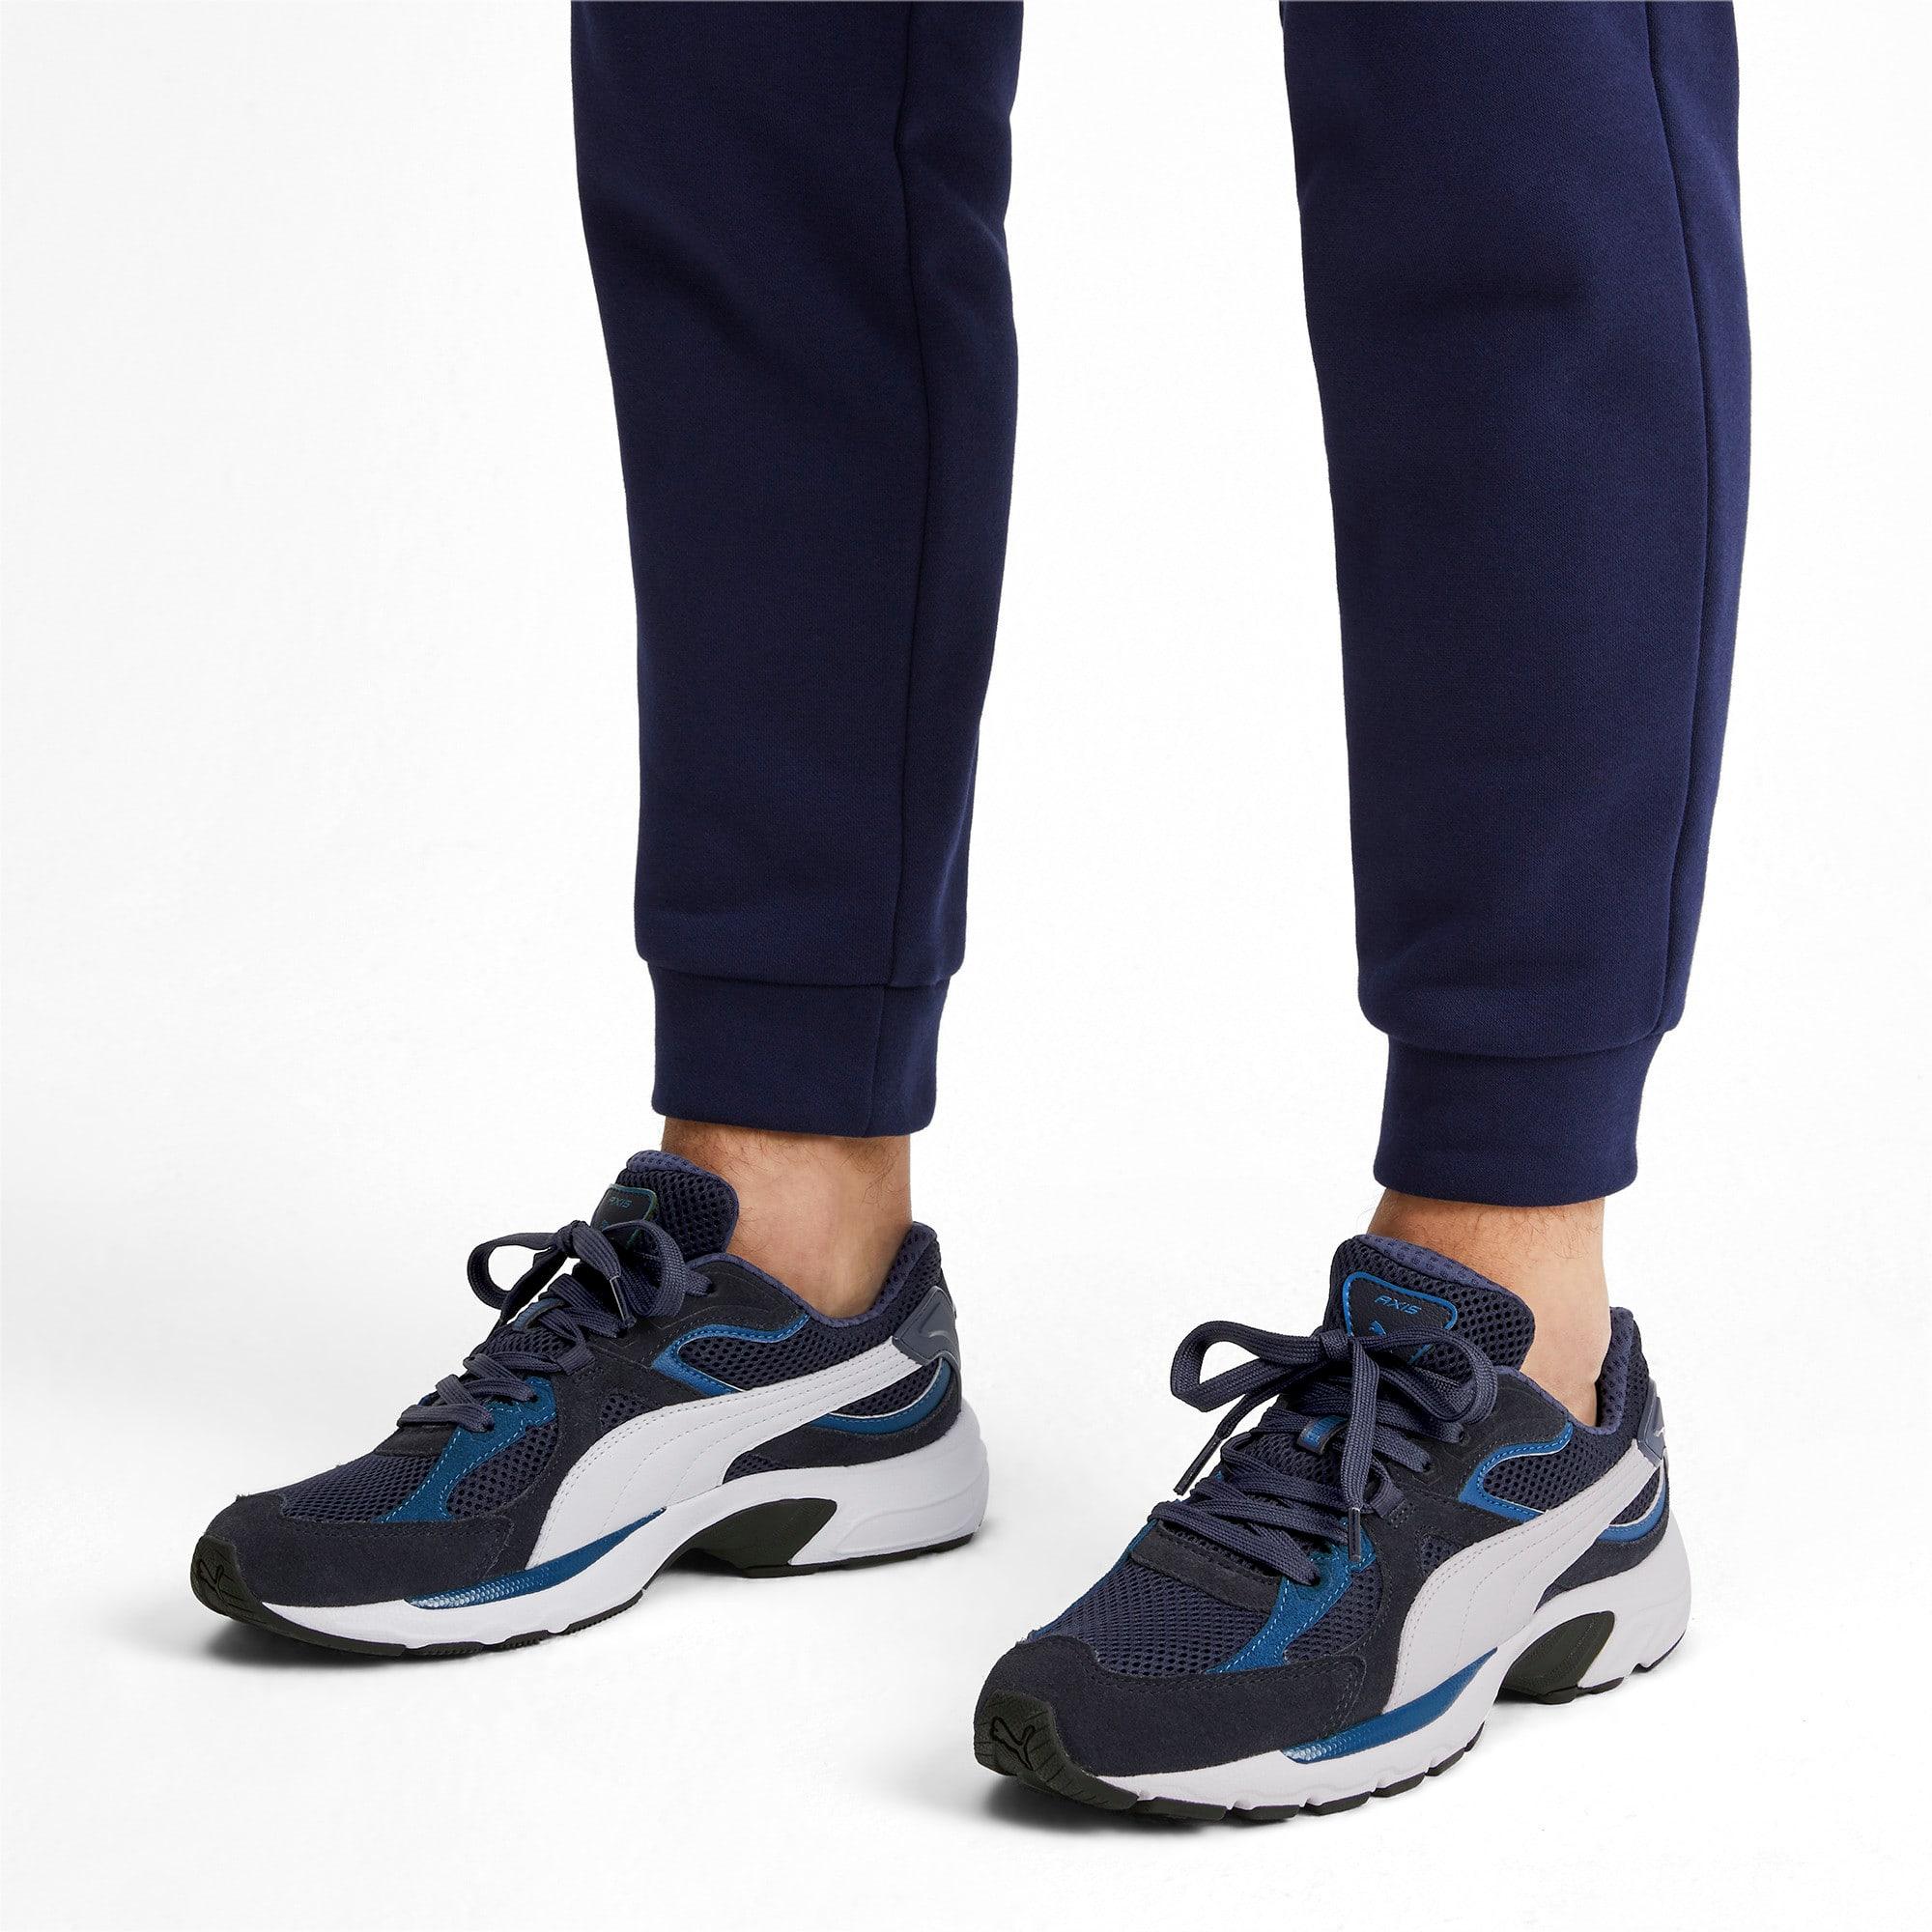 Miniatura 3 de Zapatos deportivos Axis Plus Suede, Peacoat-G Blue-White-Black, mediano